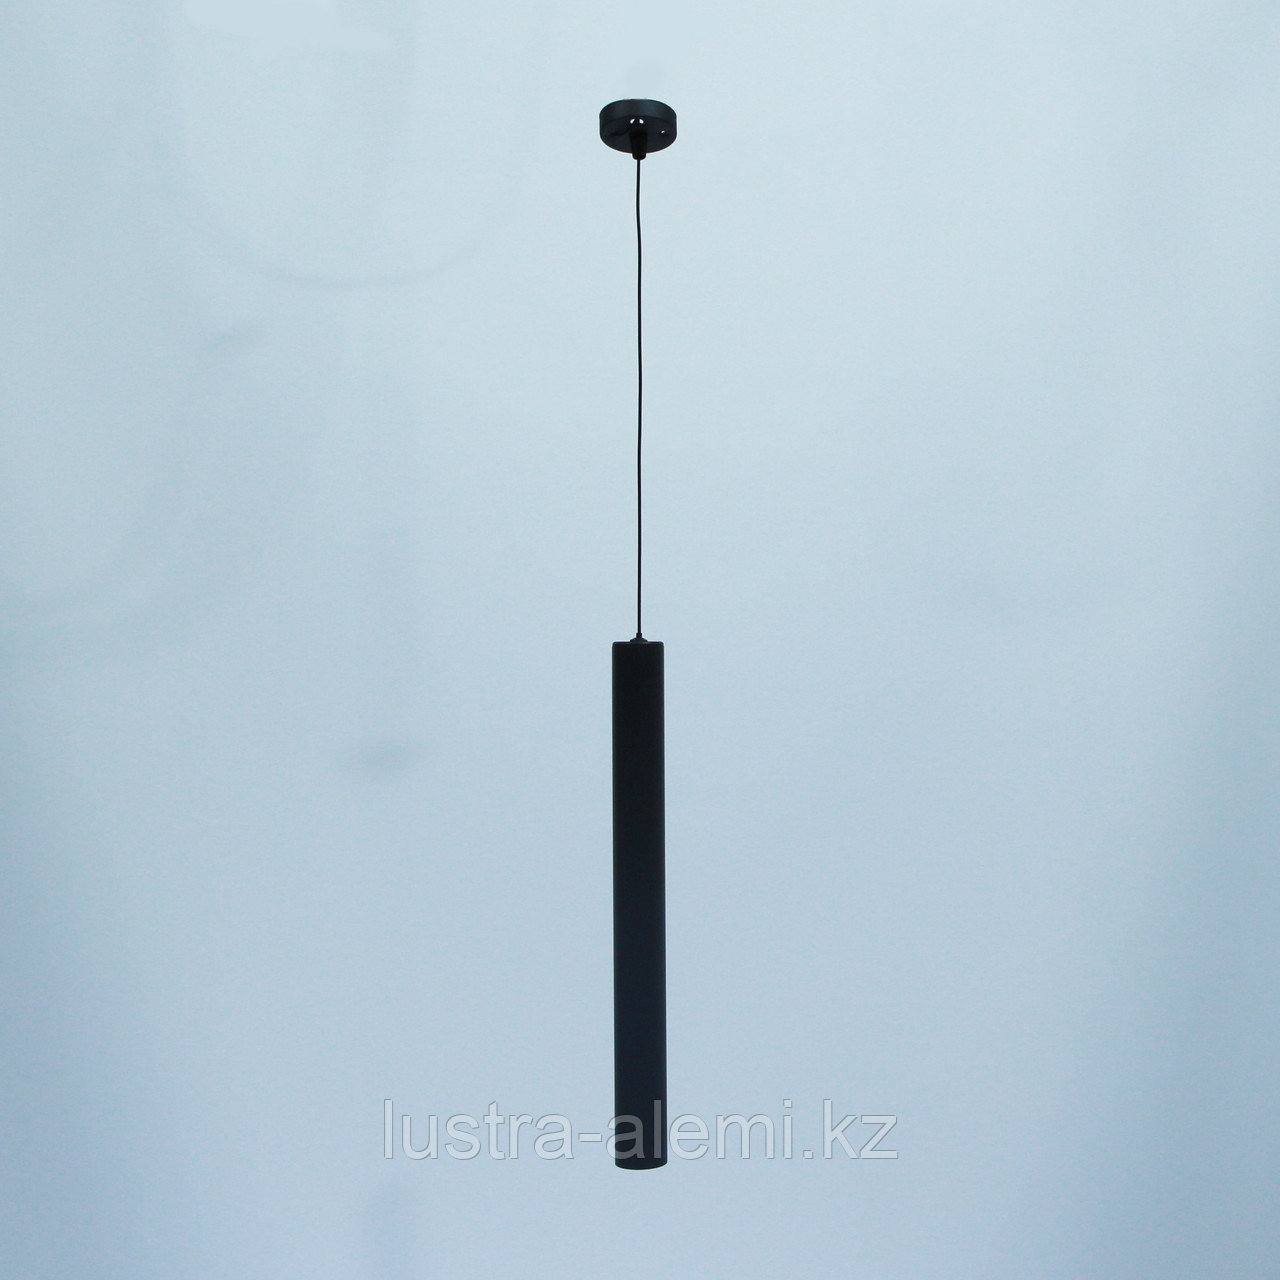 Люстра подвесная 45 мм 7w Bk